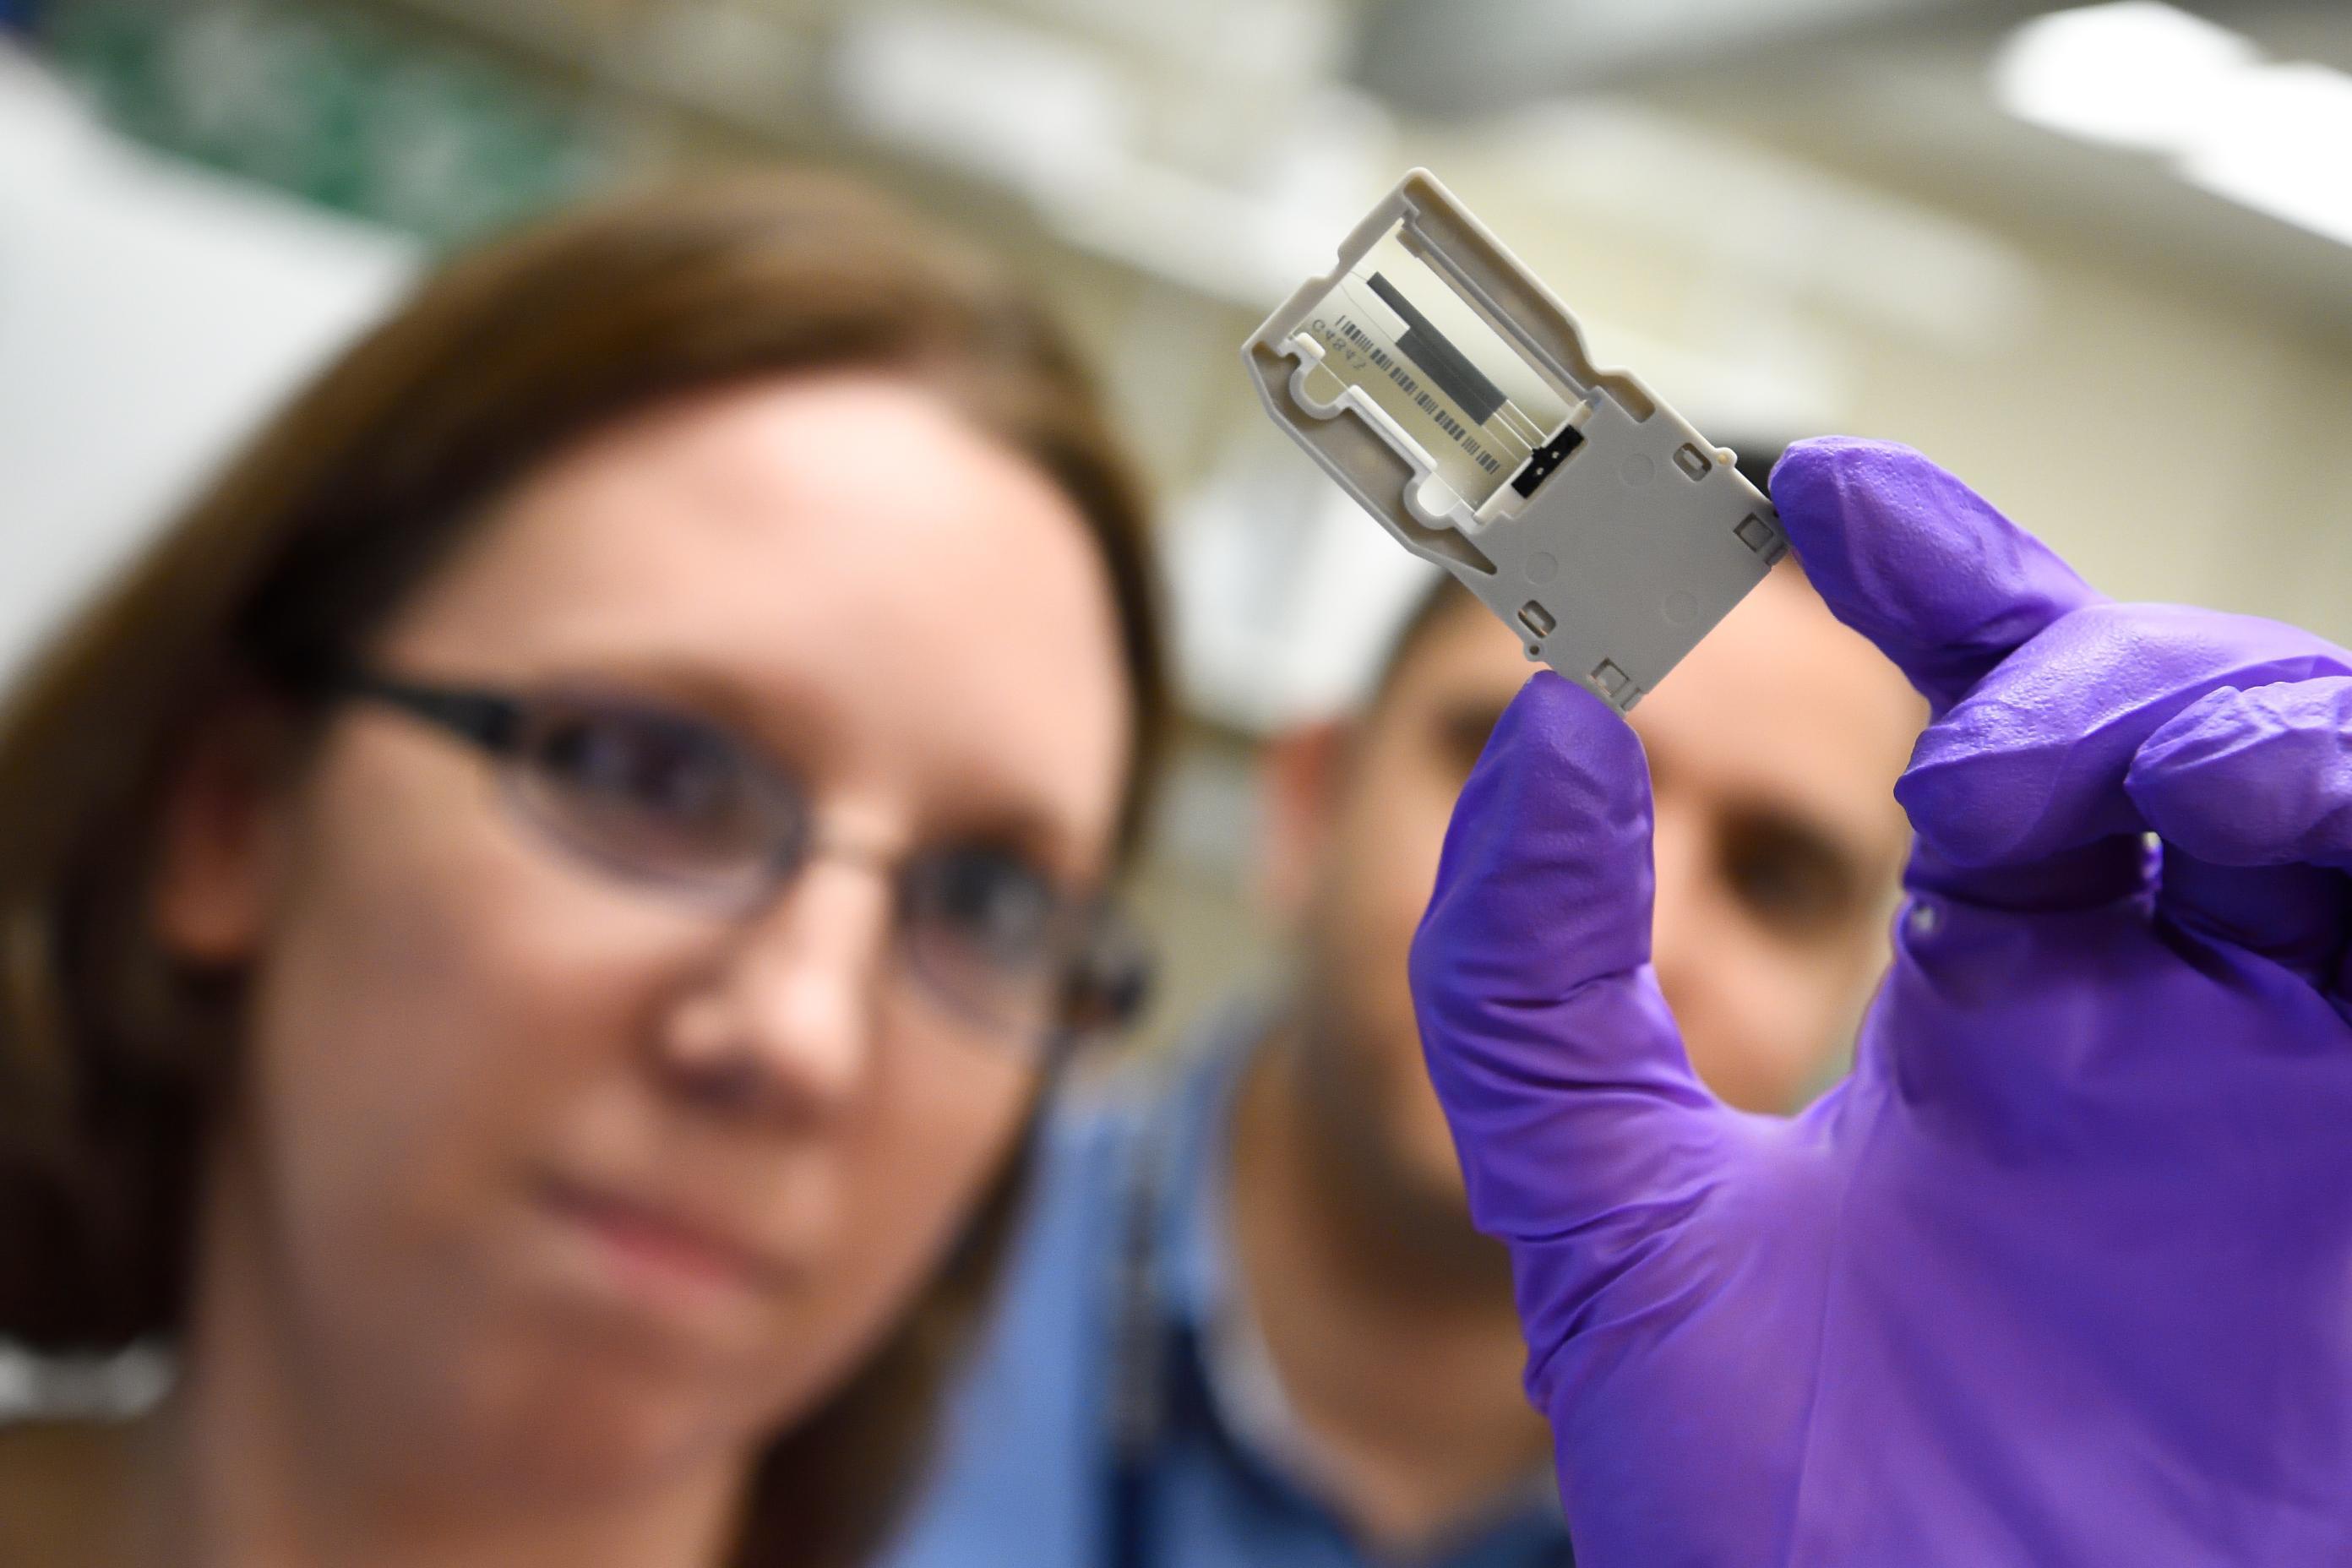 Fundamental research that drives advances in medicine